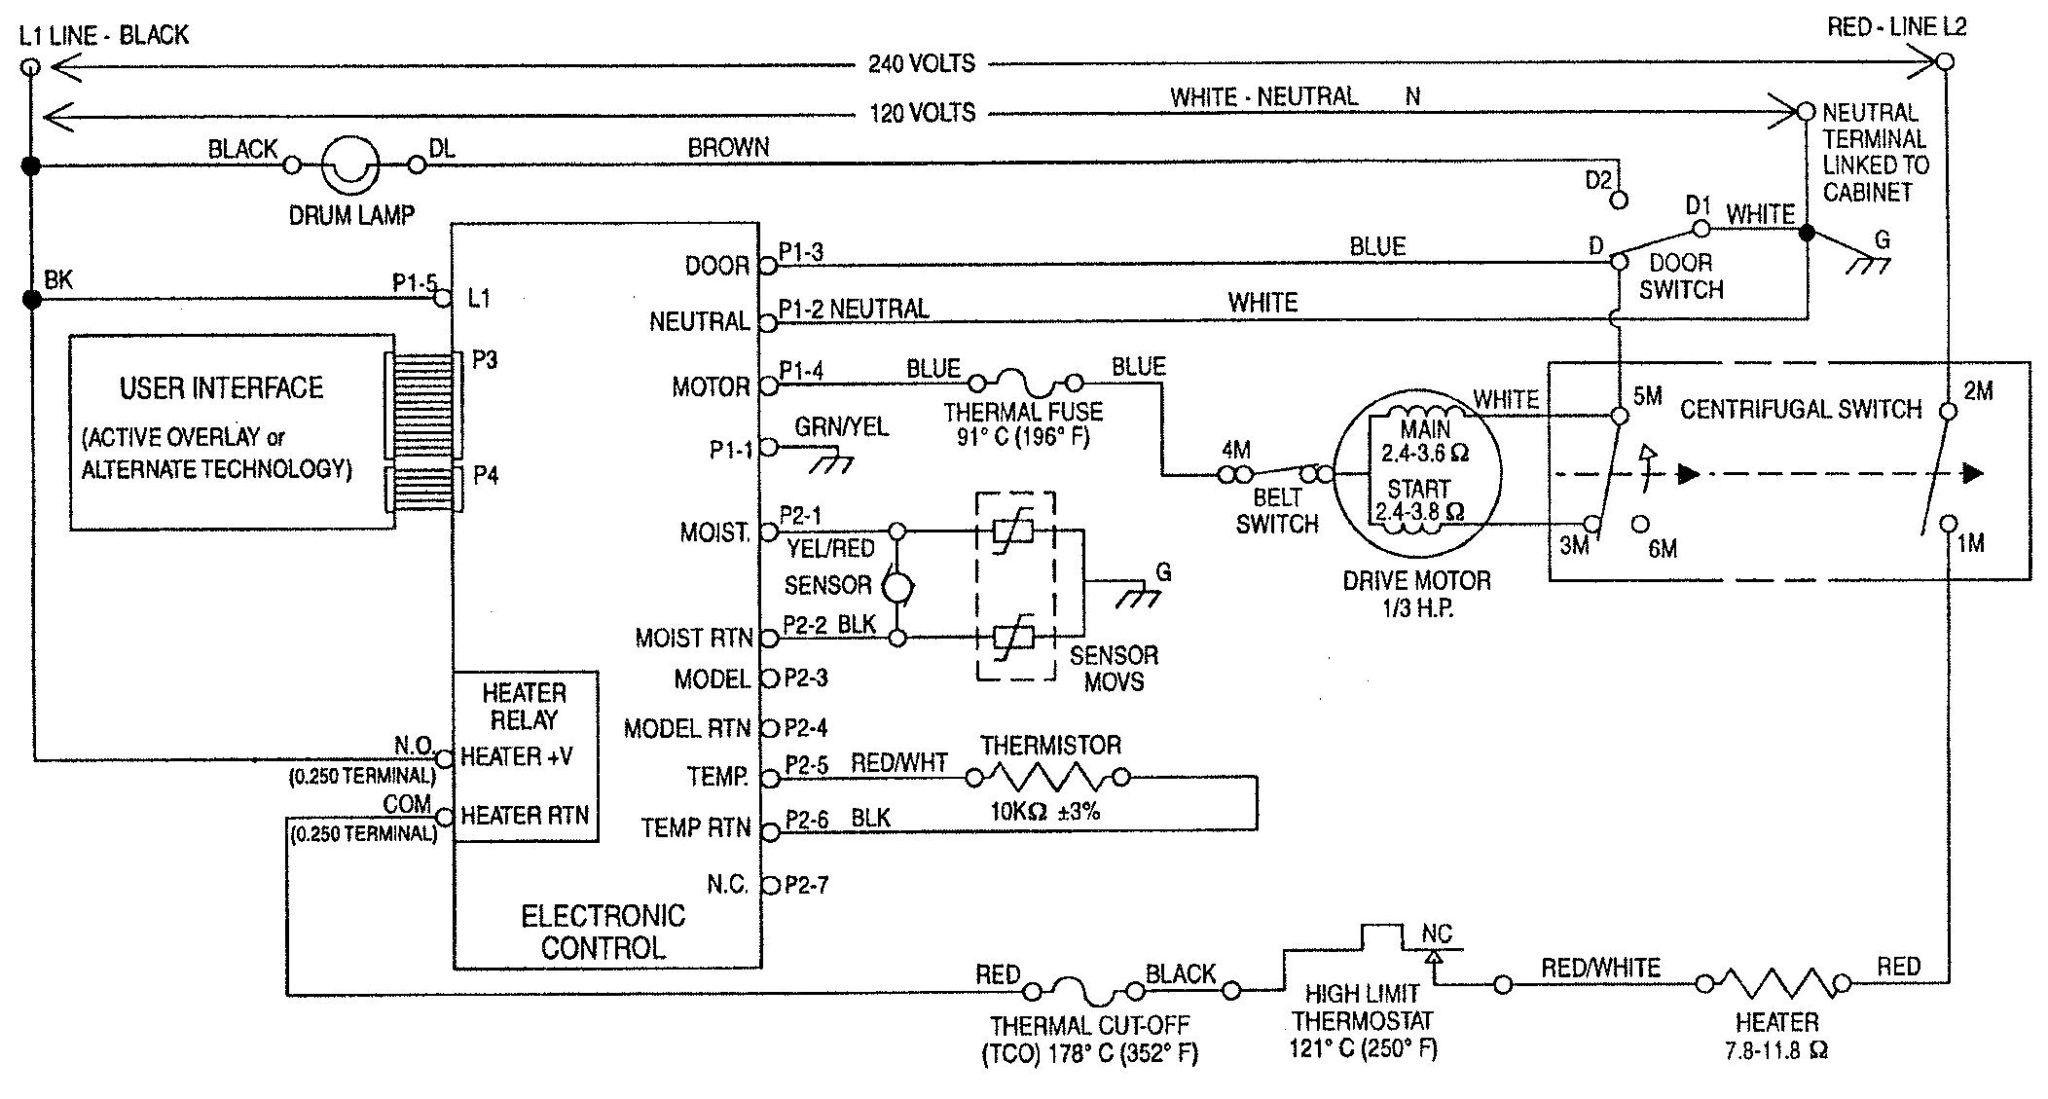 New Electrical Wiring Design Diagram Wiringdiagram Diagramming Diagramm Visuals Visualisation G Electrical Wiring Diagram Diagram Home Electrical Wiring